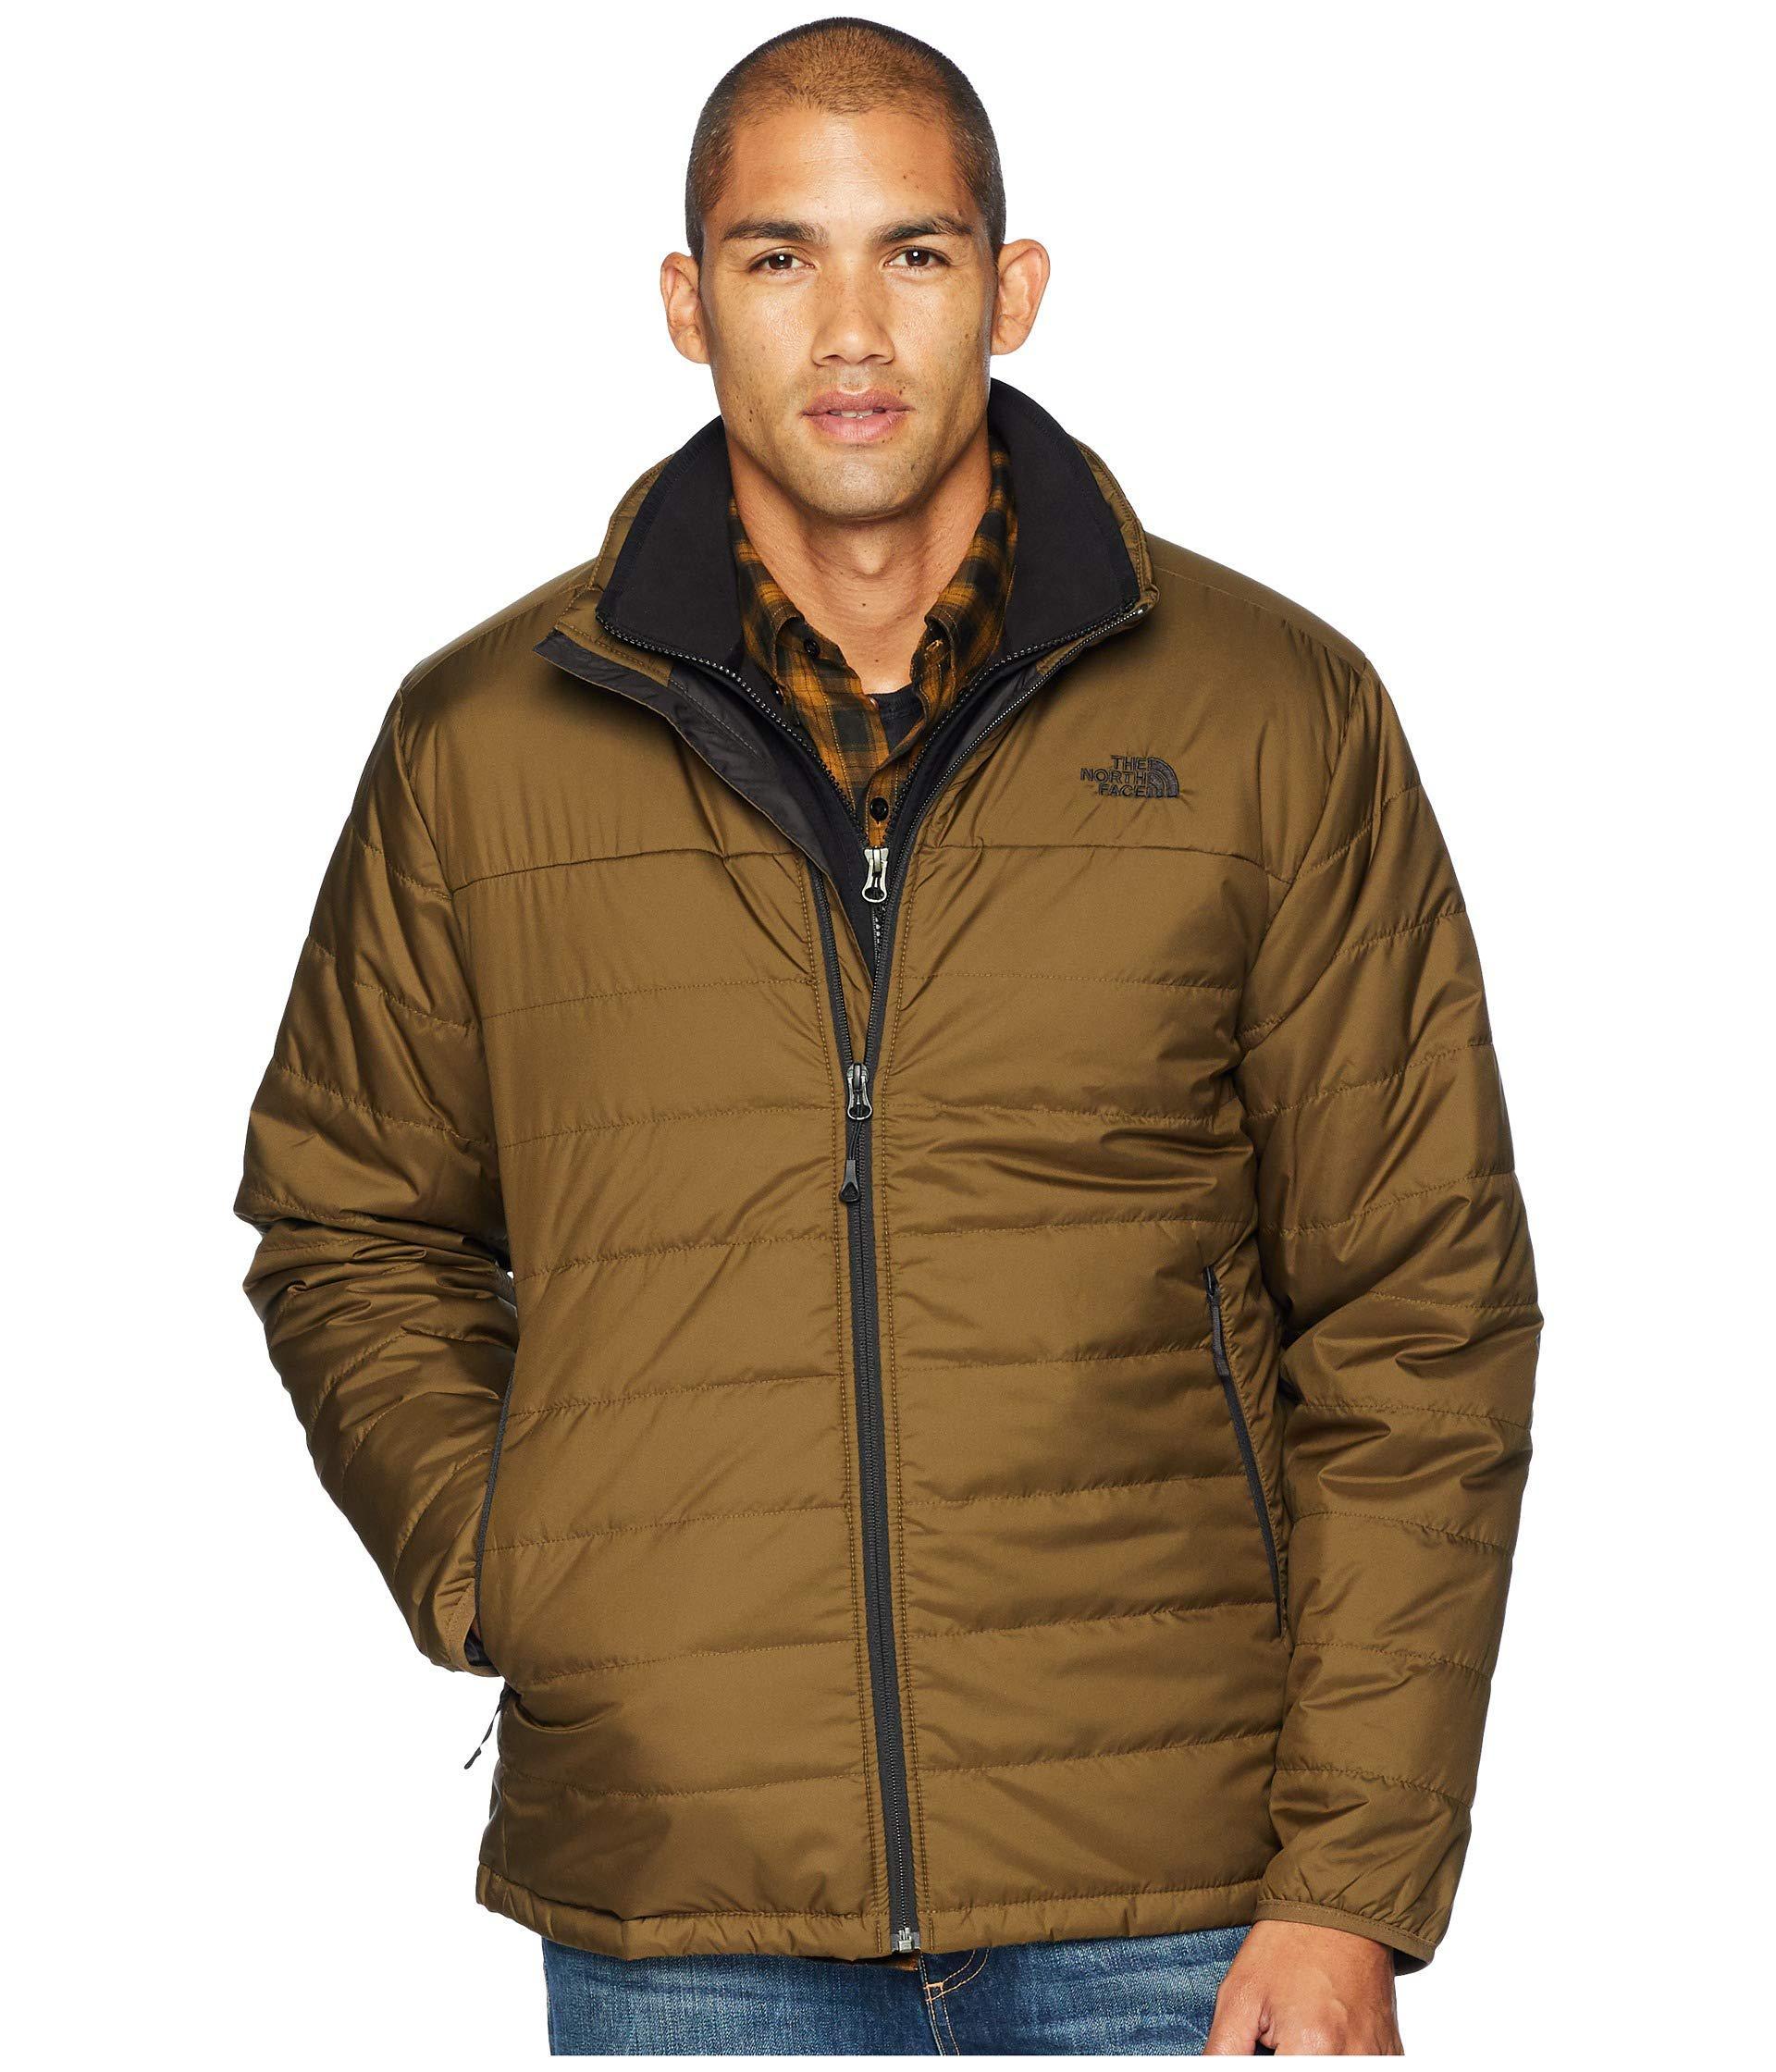 3cd8abdd4 The North Face Bombay Jacket (beech Green) Men's Jacket for men